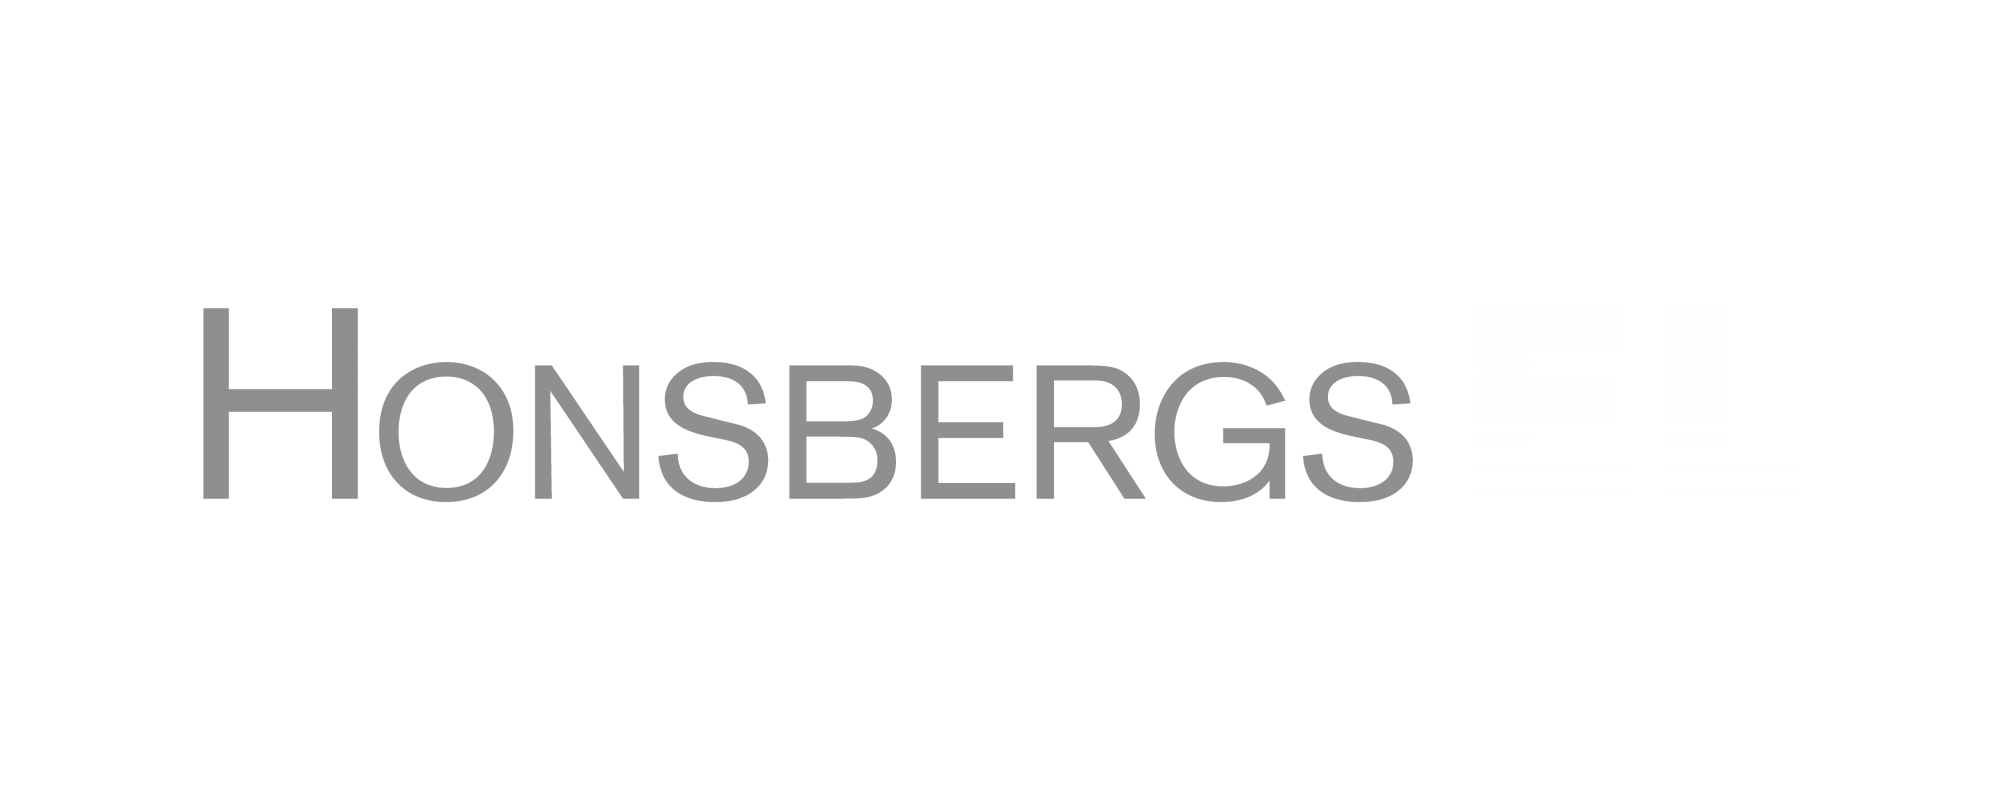 Honsbergs EL AB